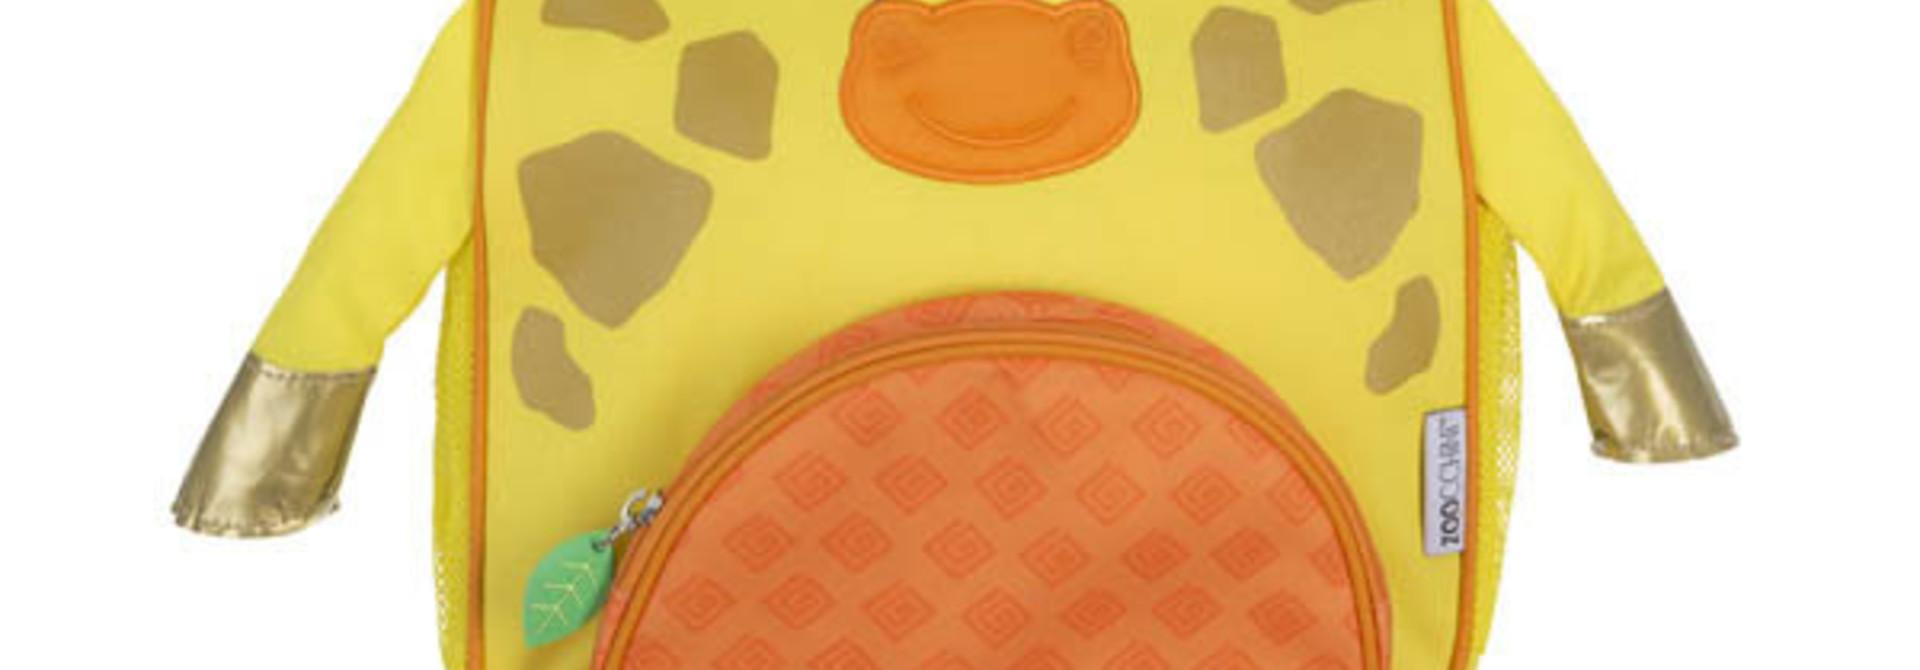 Sac à dos pour enfants Jamie la girafe